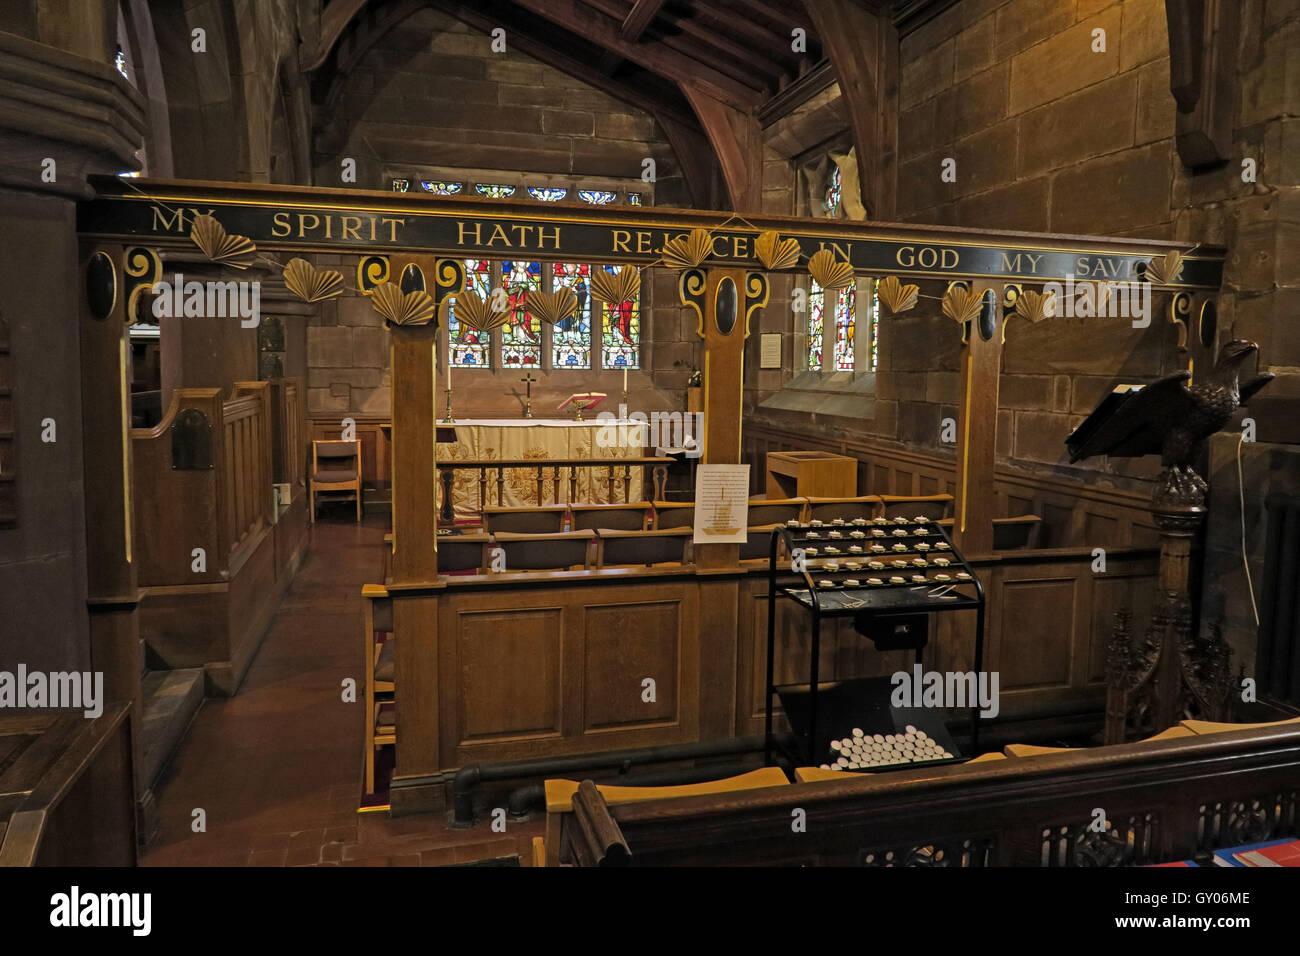 Laden Sie dieses Alamy Stockfoto Str. Wilfrids Kirche Grappenhall - Marienkapelle, Warrington Cheshire - GY06ME